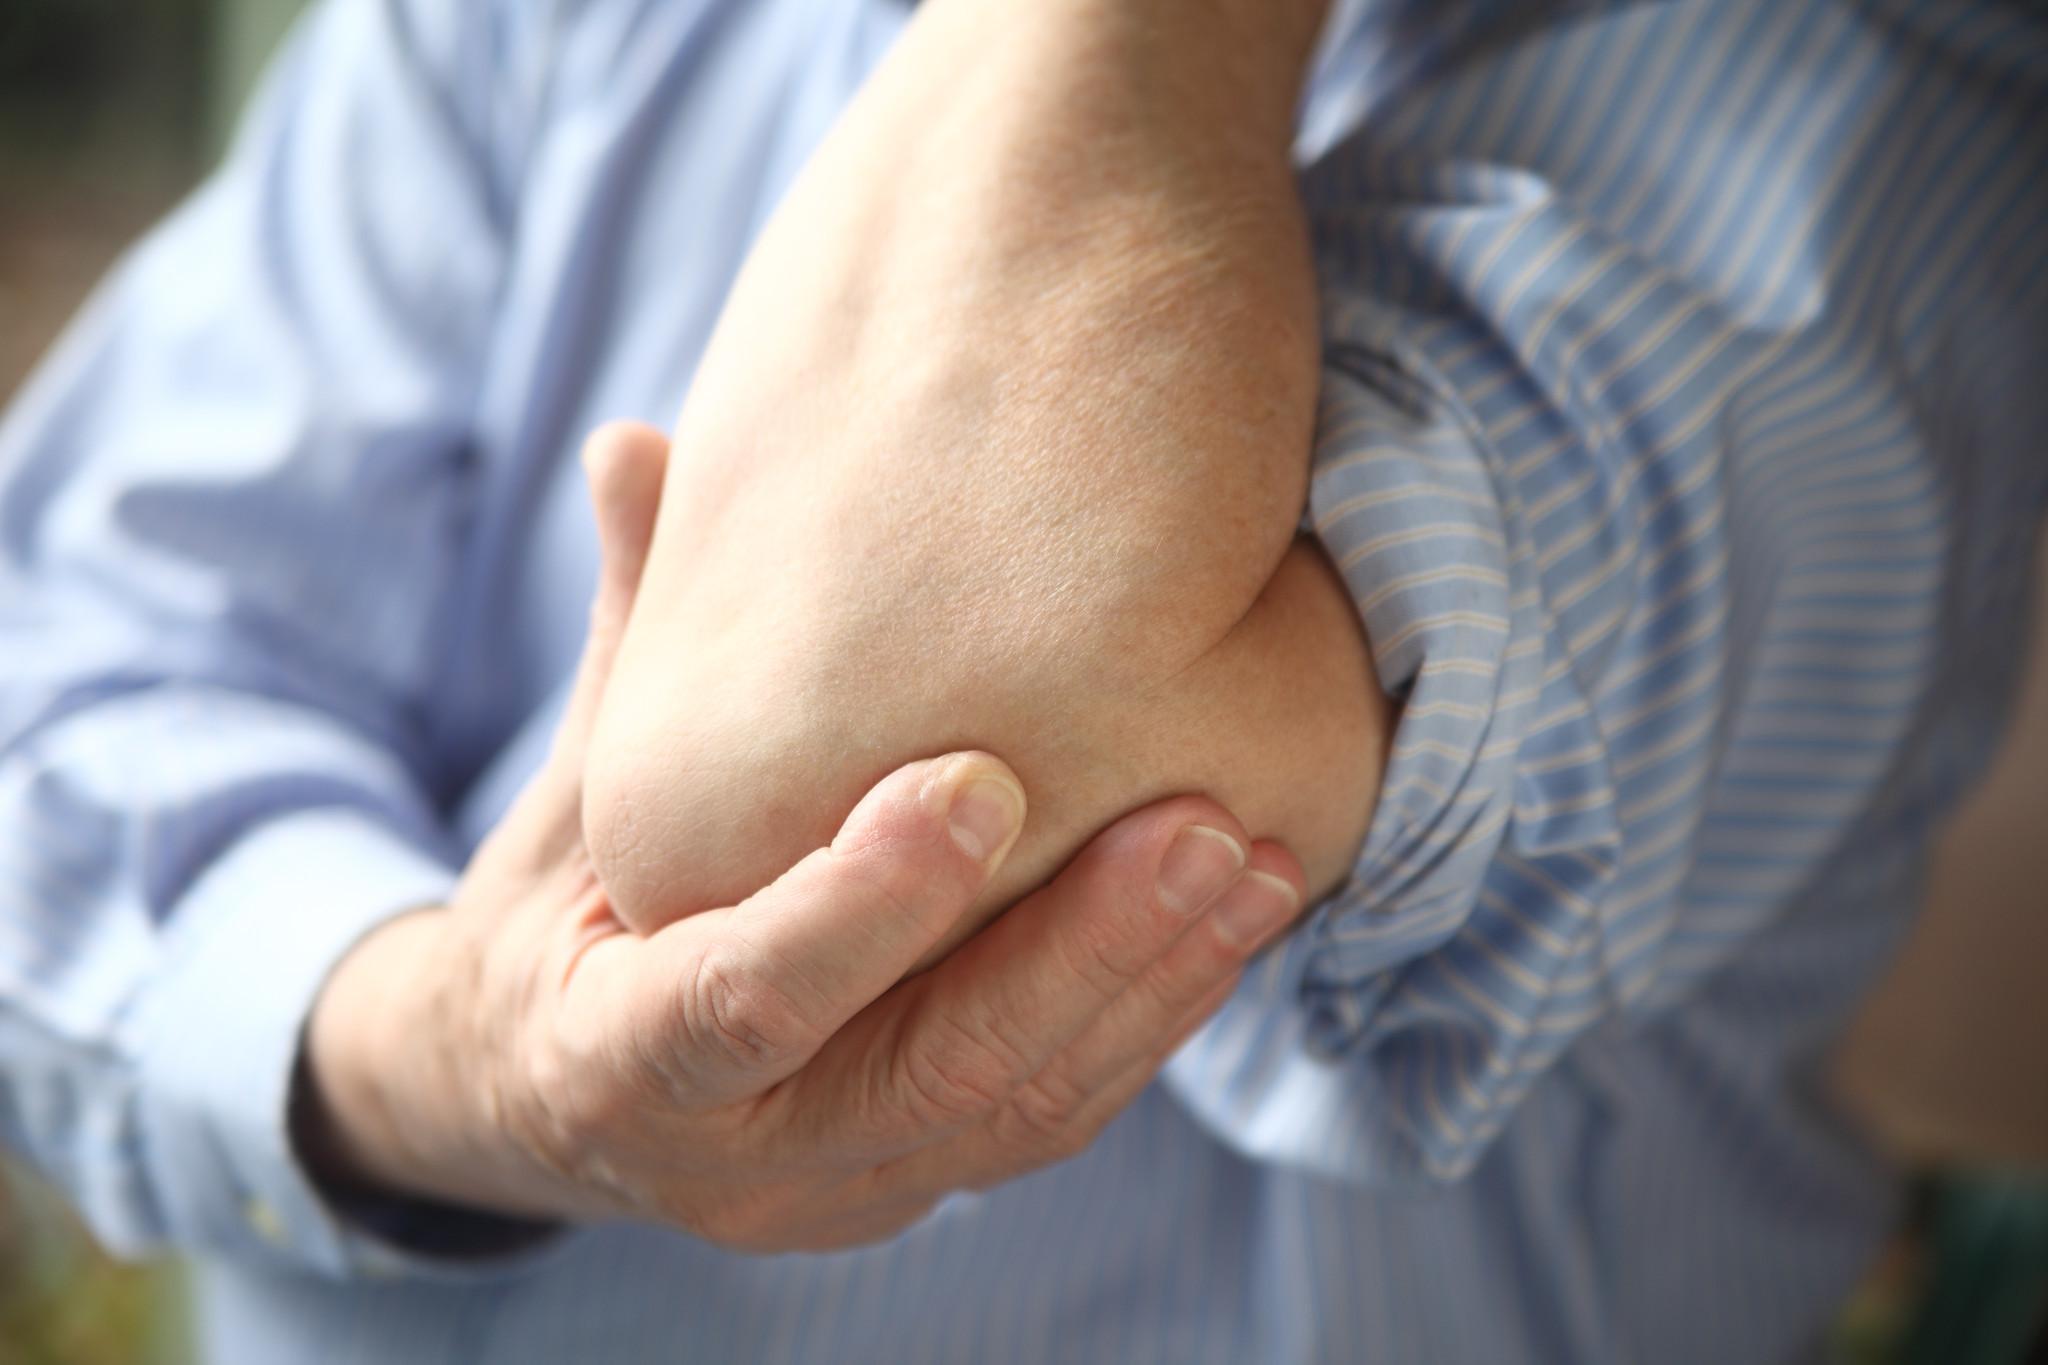 Бурсит локтевого сустава: симптомы, лечение локтевого бурсита